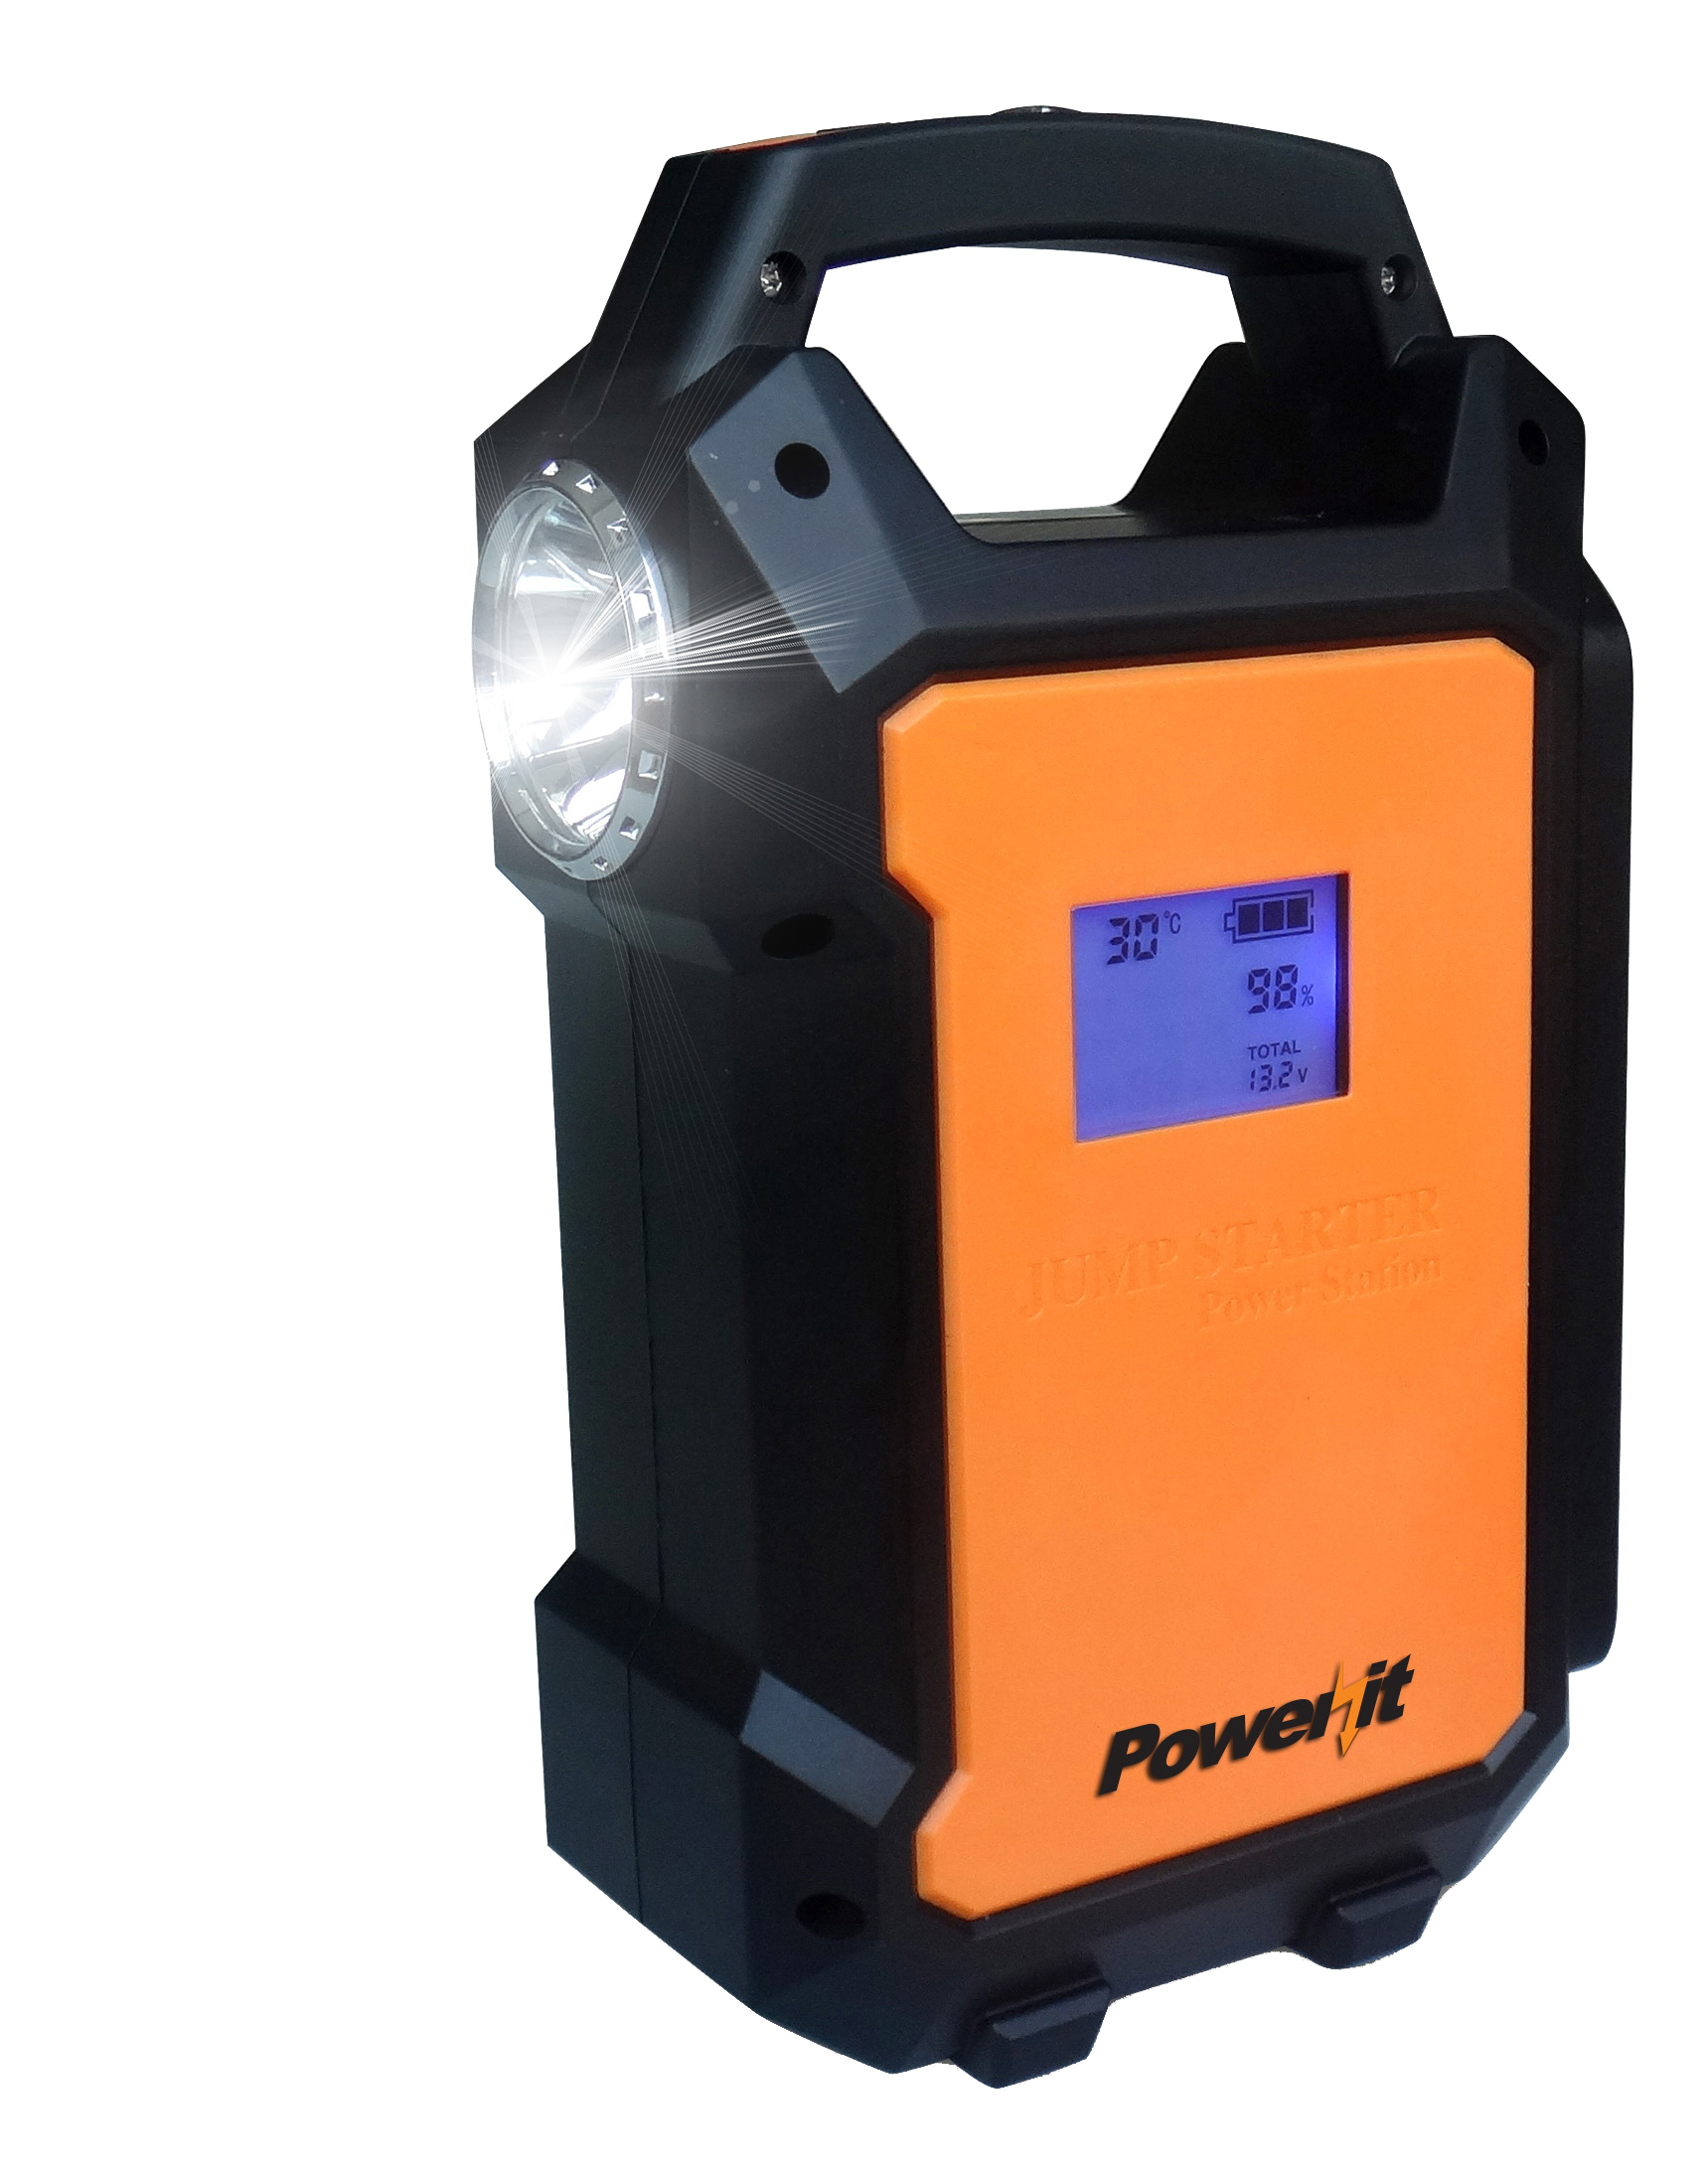 Impecca Power It portable jump starter line